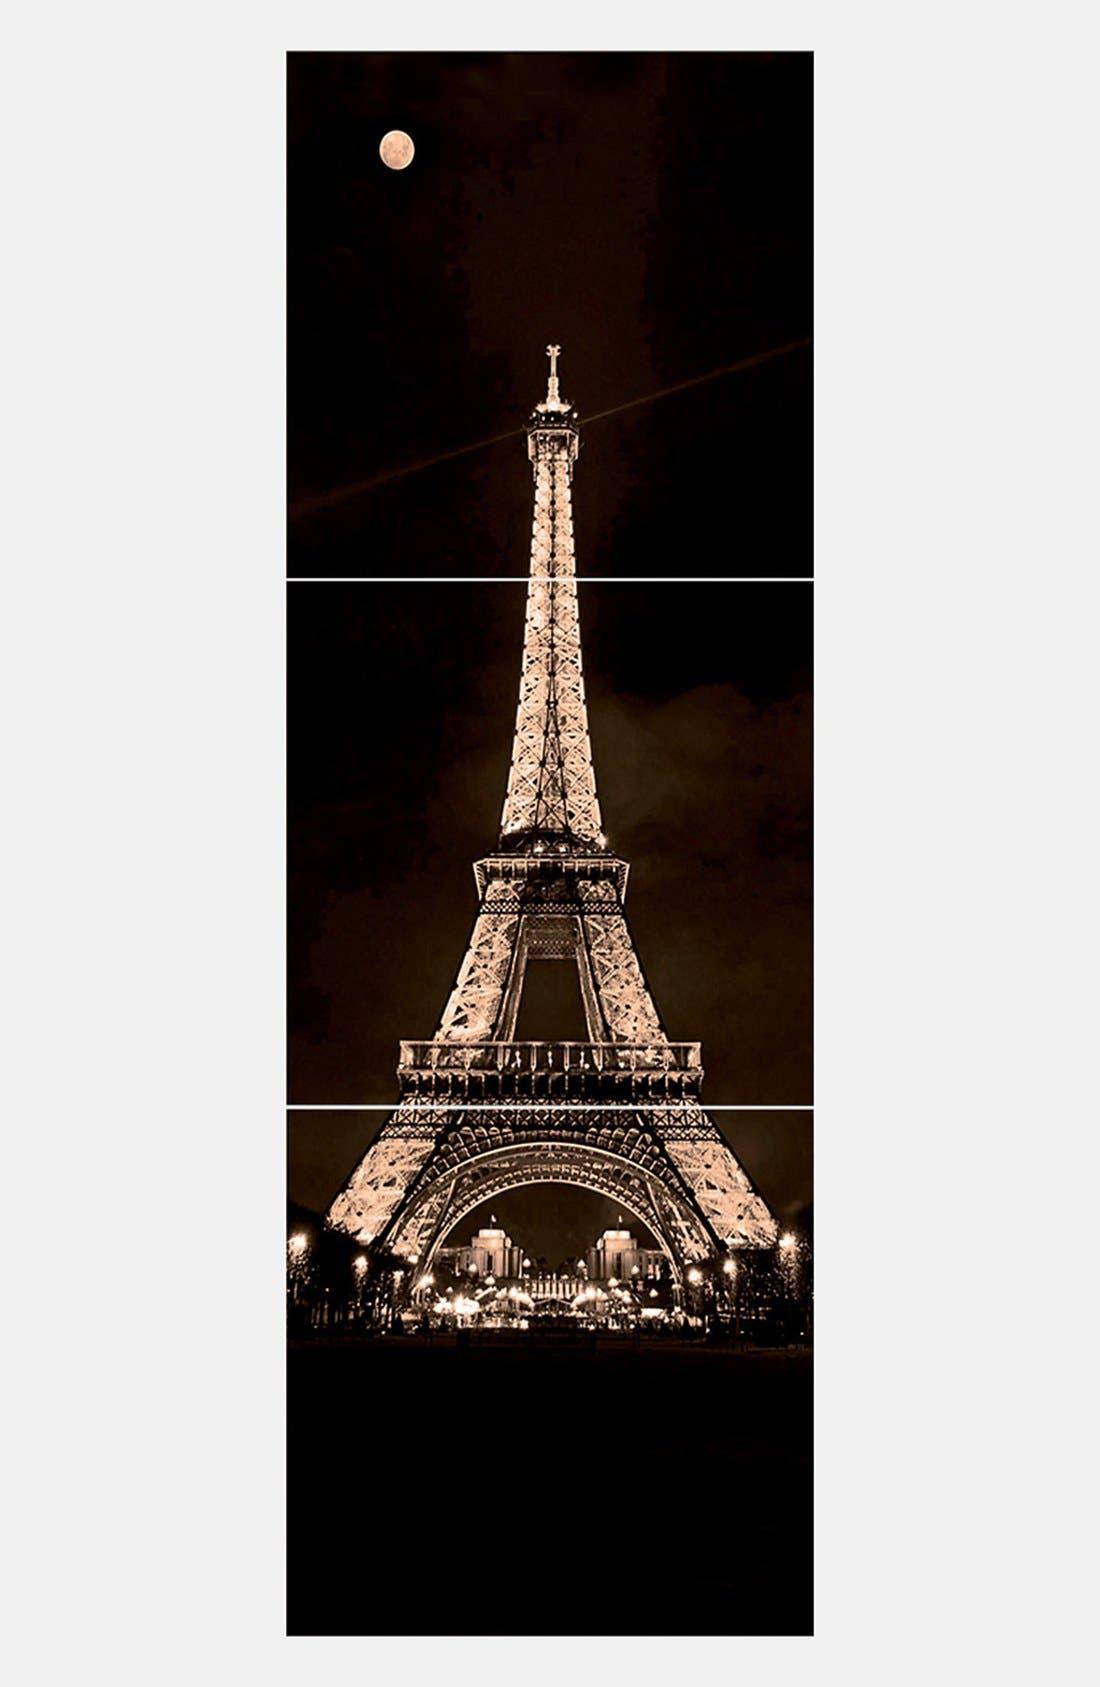 Alternate Image 1 Selected - Wallpops Eiffel Tower Wall Art